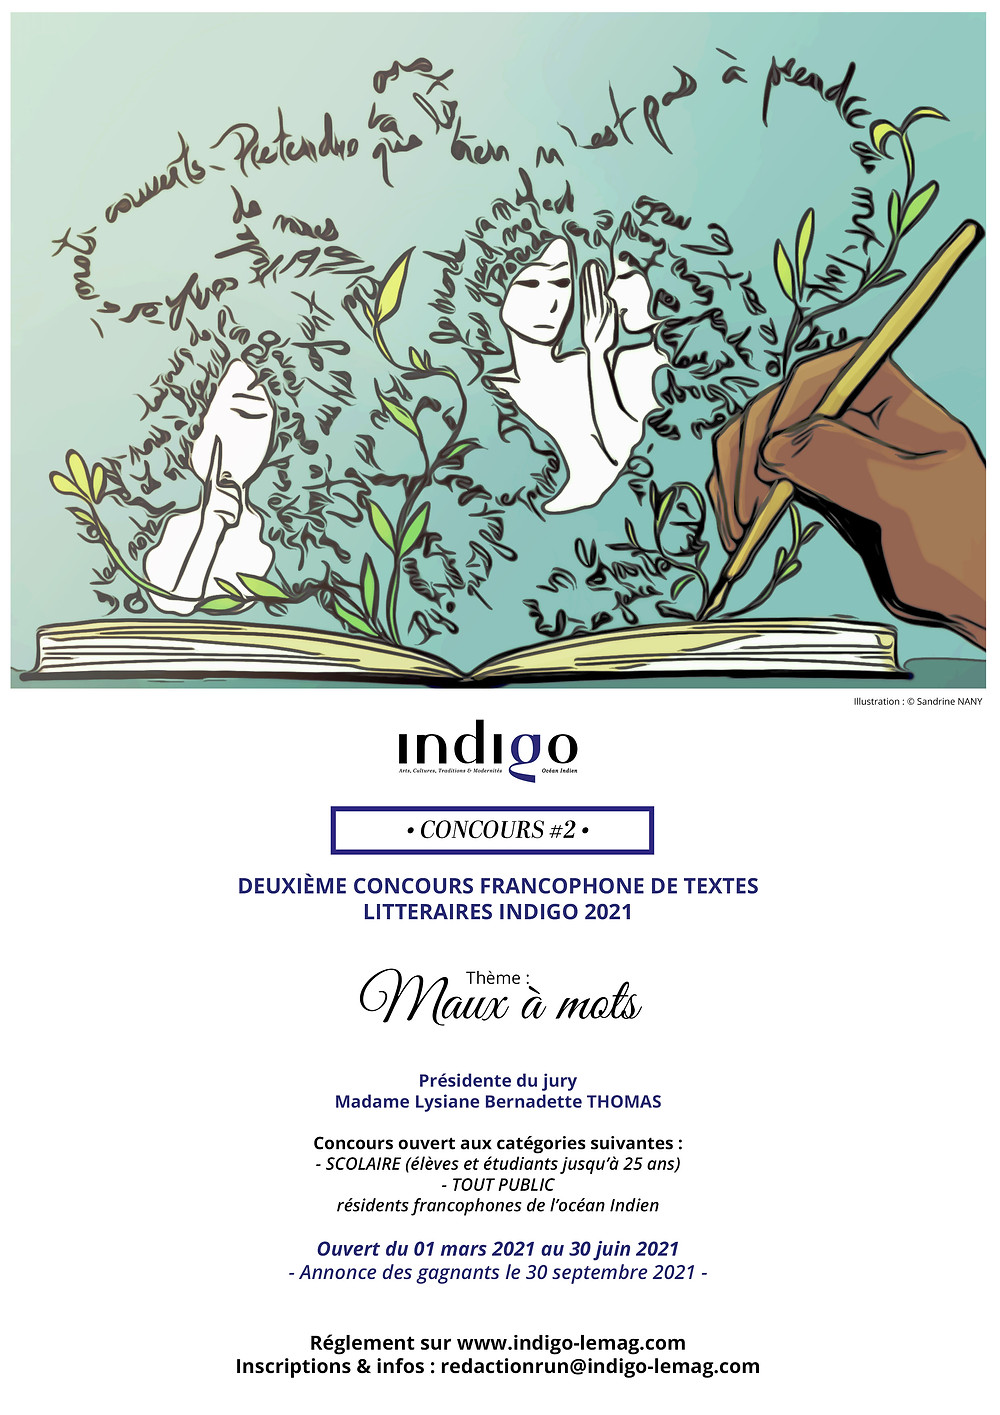 Affiche concours #2 Indigo